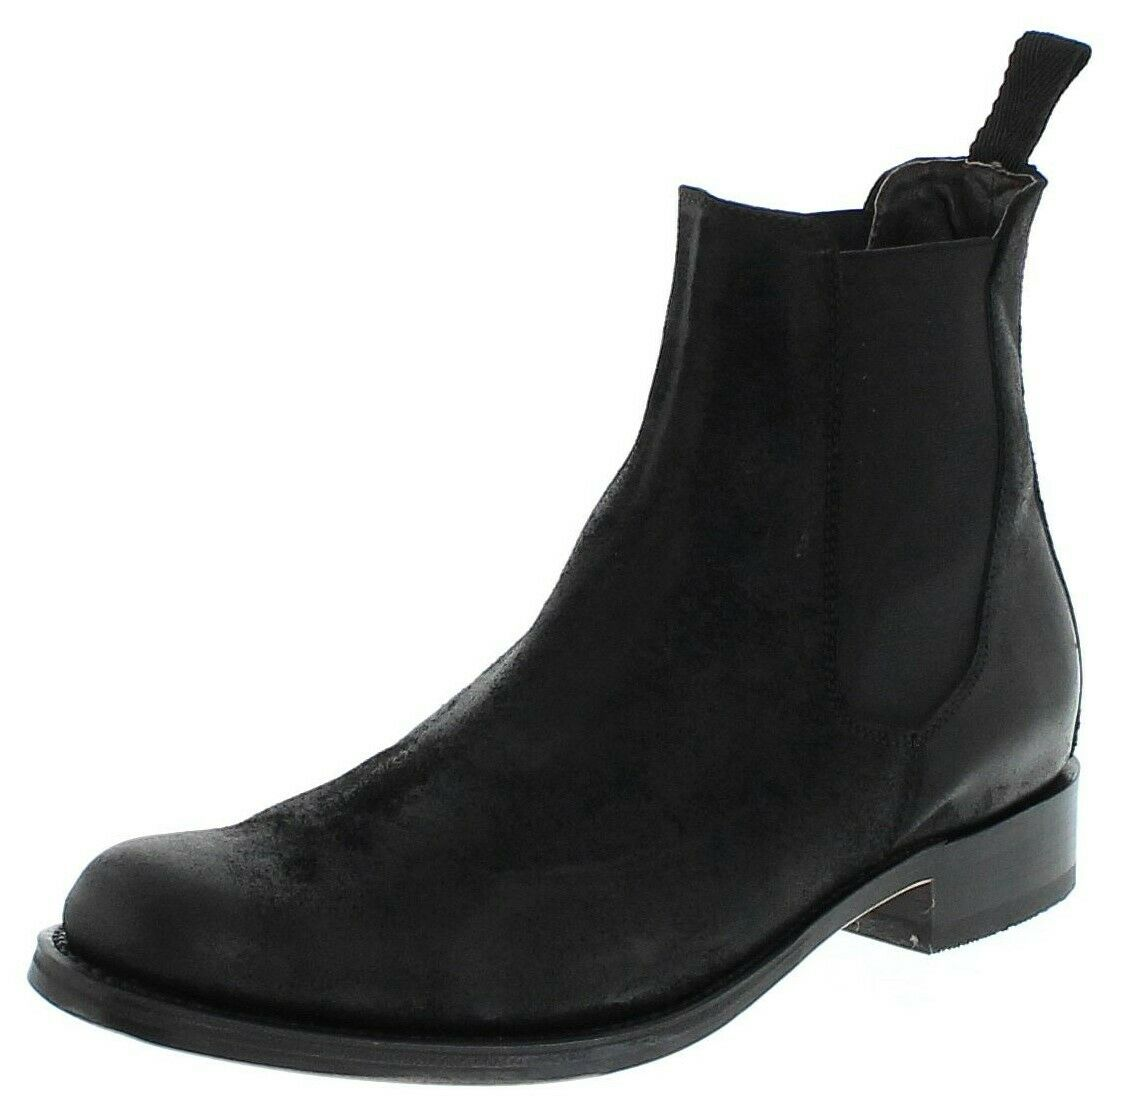 Sendra Stiefel Stiefel JOHN II Schwarz Chelsea Stiefel Fashion Stiefelette   | Erlesene Materialien